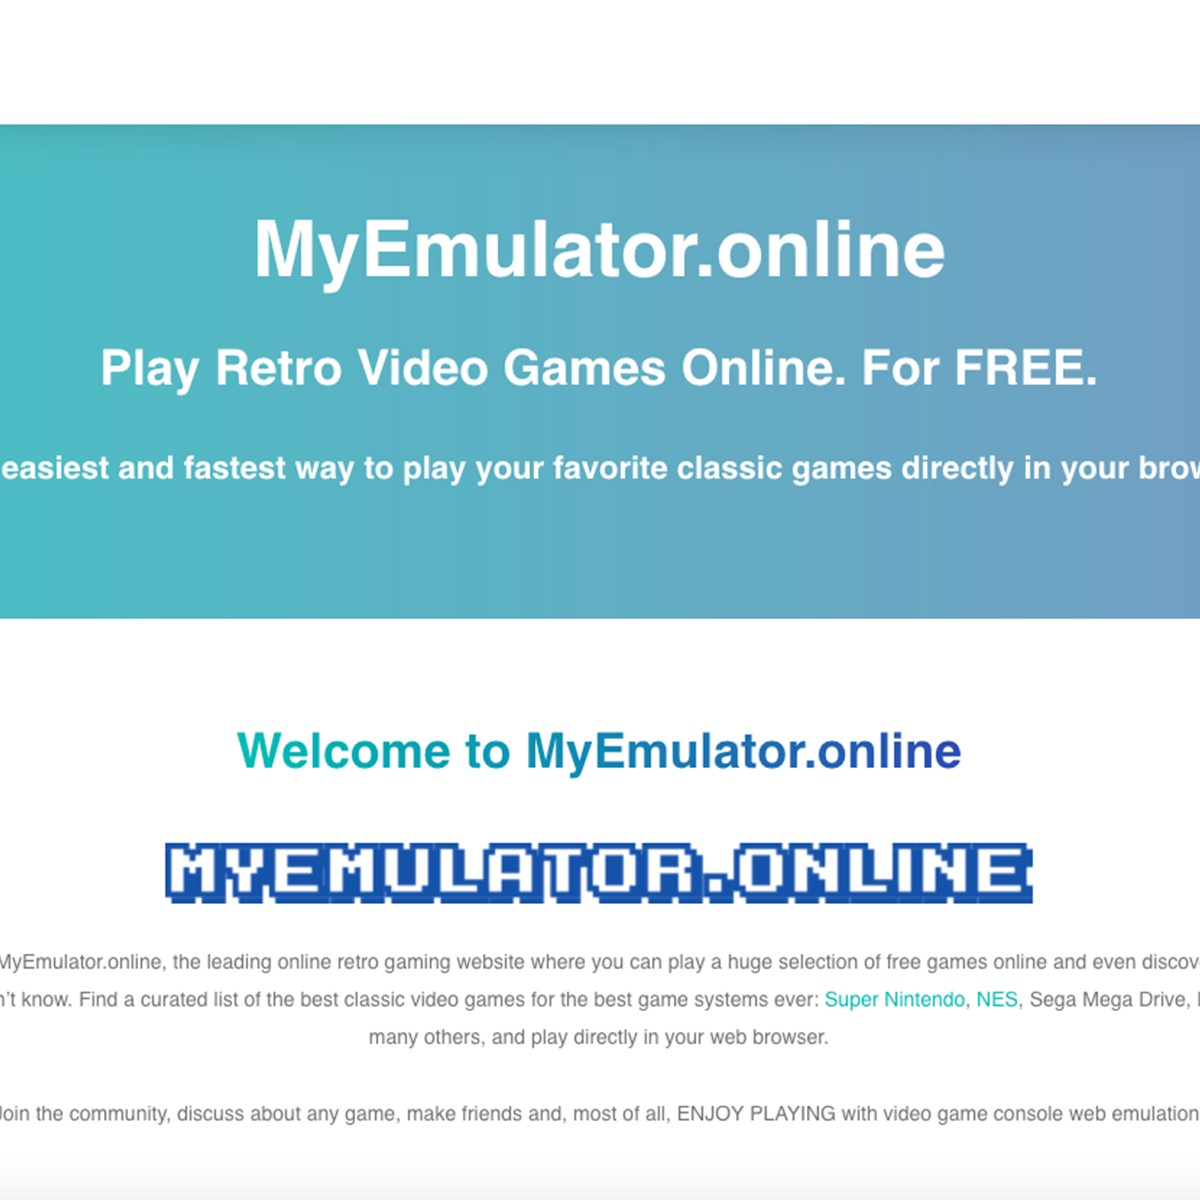 MyEmulatorOnline Alternatives and Similar Games